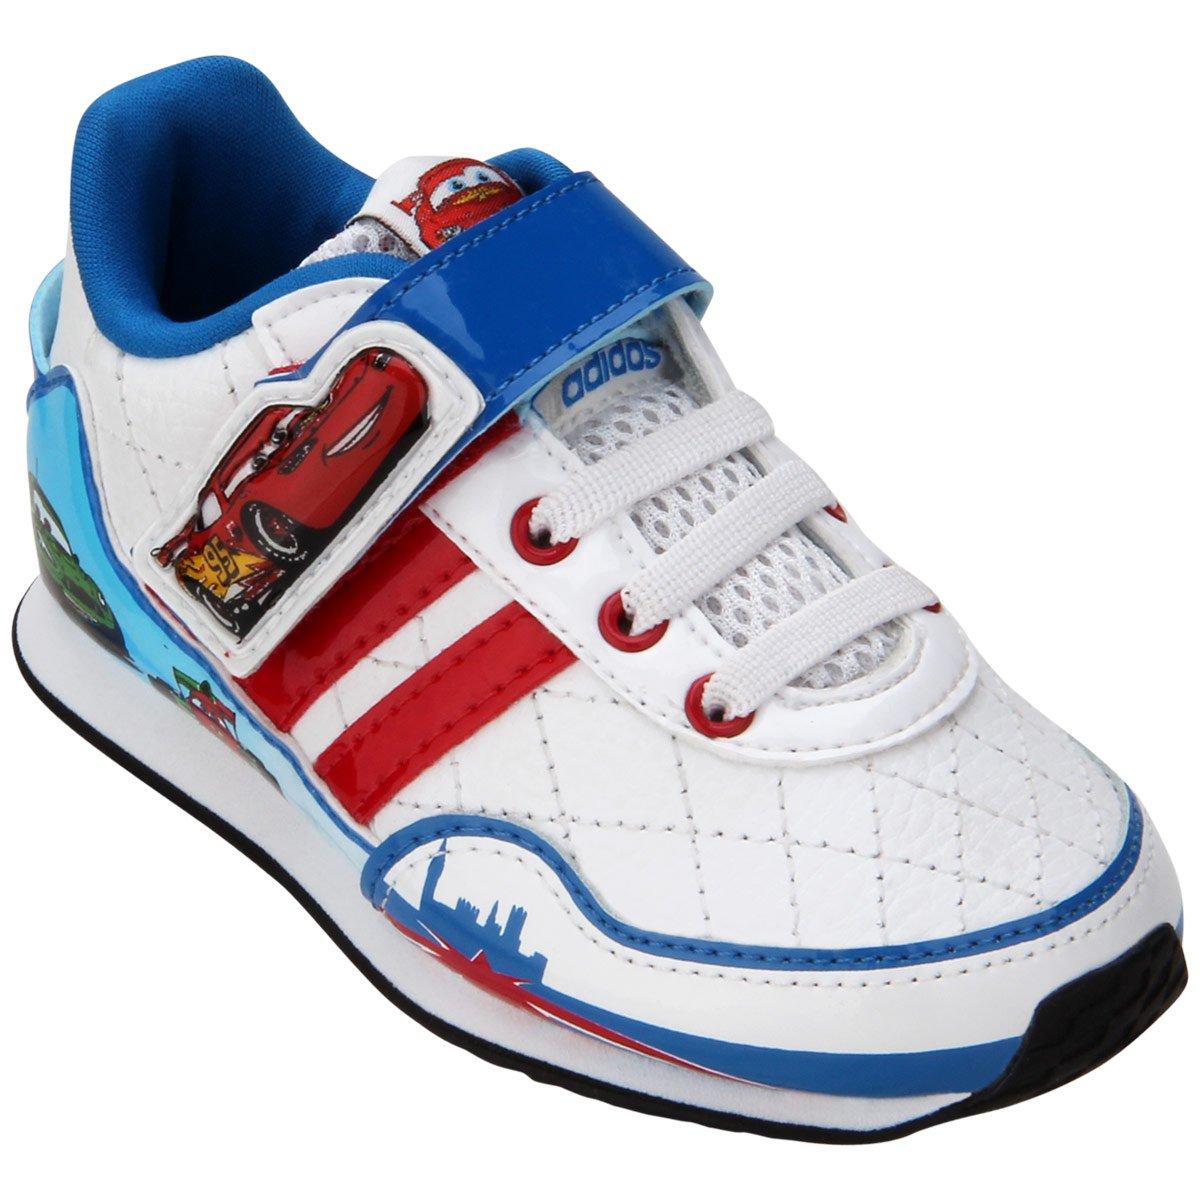 best service c19b6 6e53e Tênis Adidas Disney Cars 2 CF Mcqueen Infantil - Compre Agor